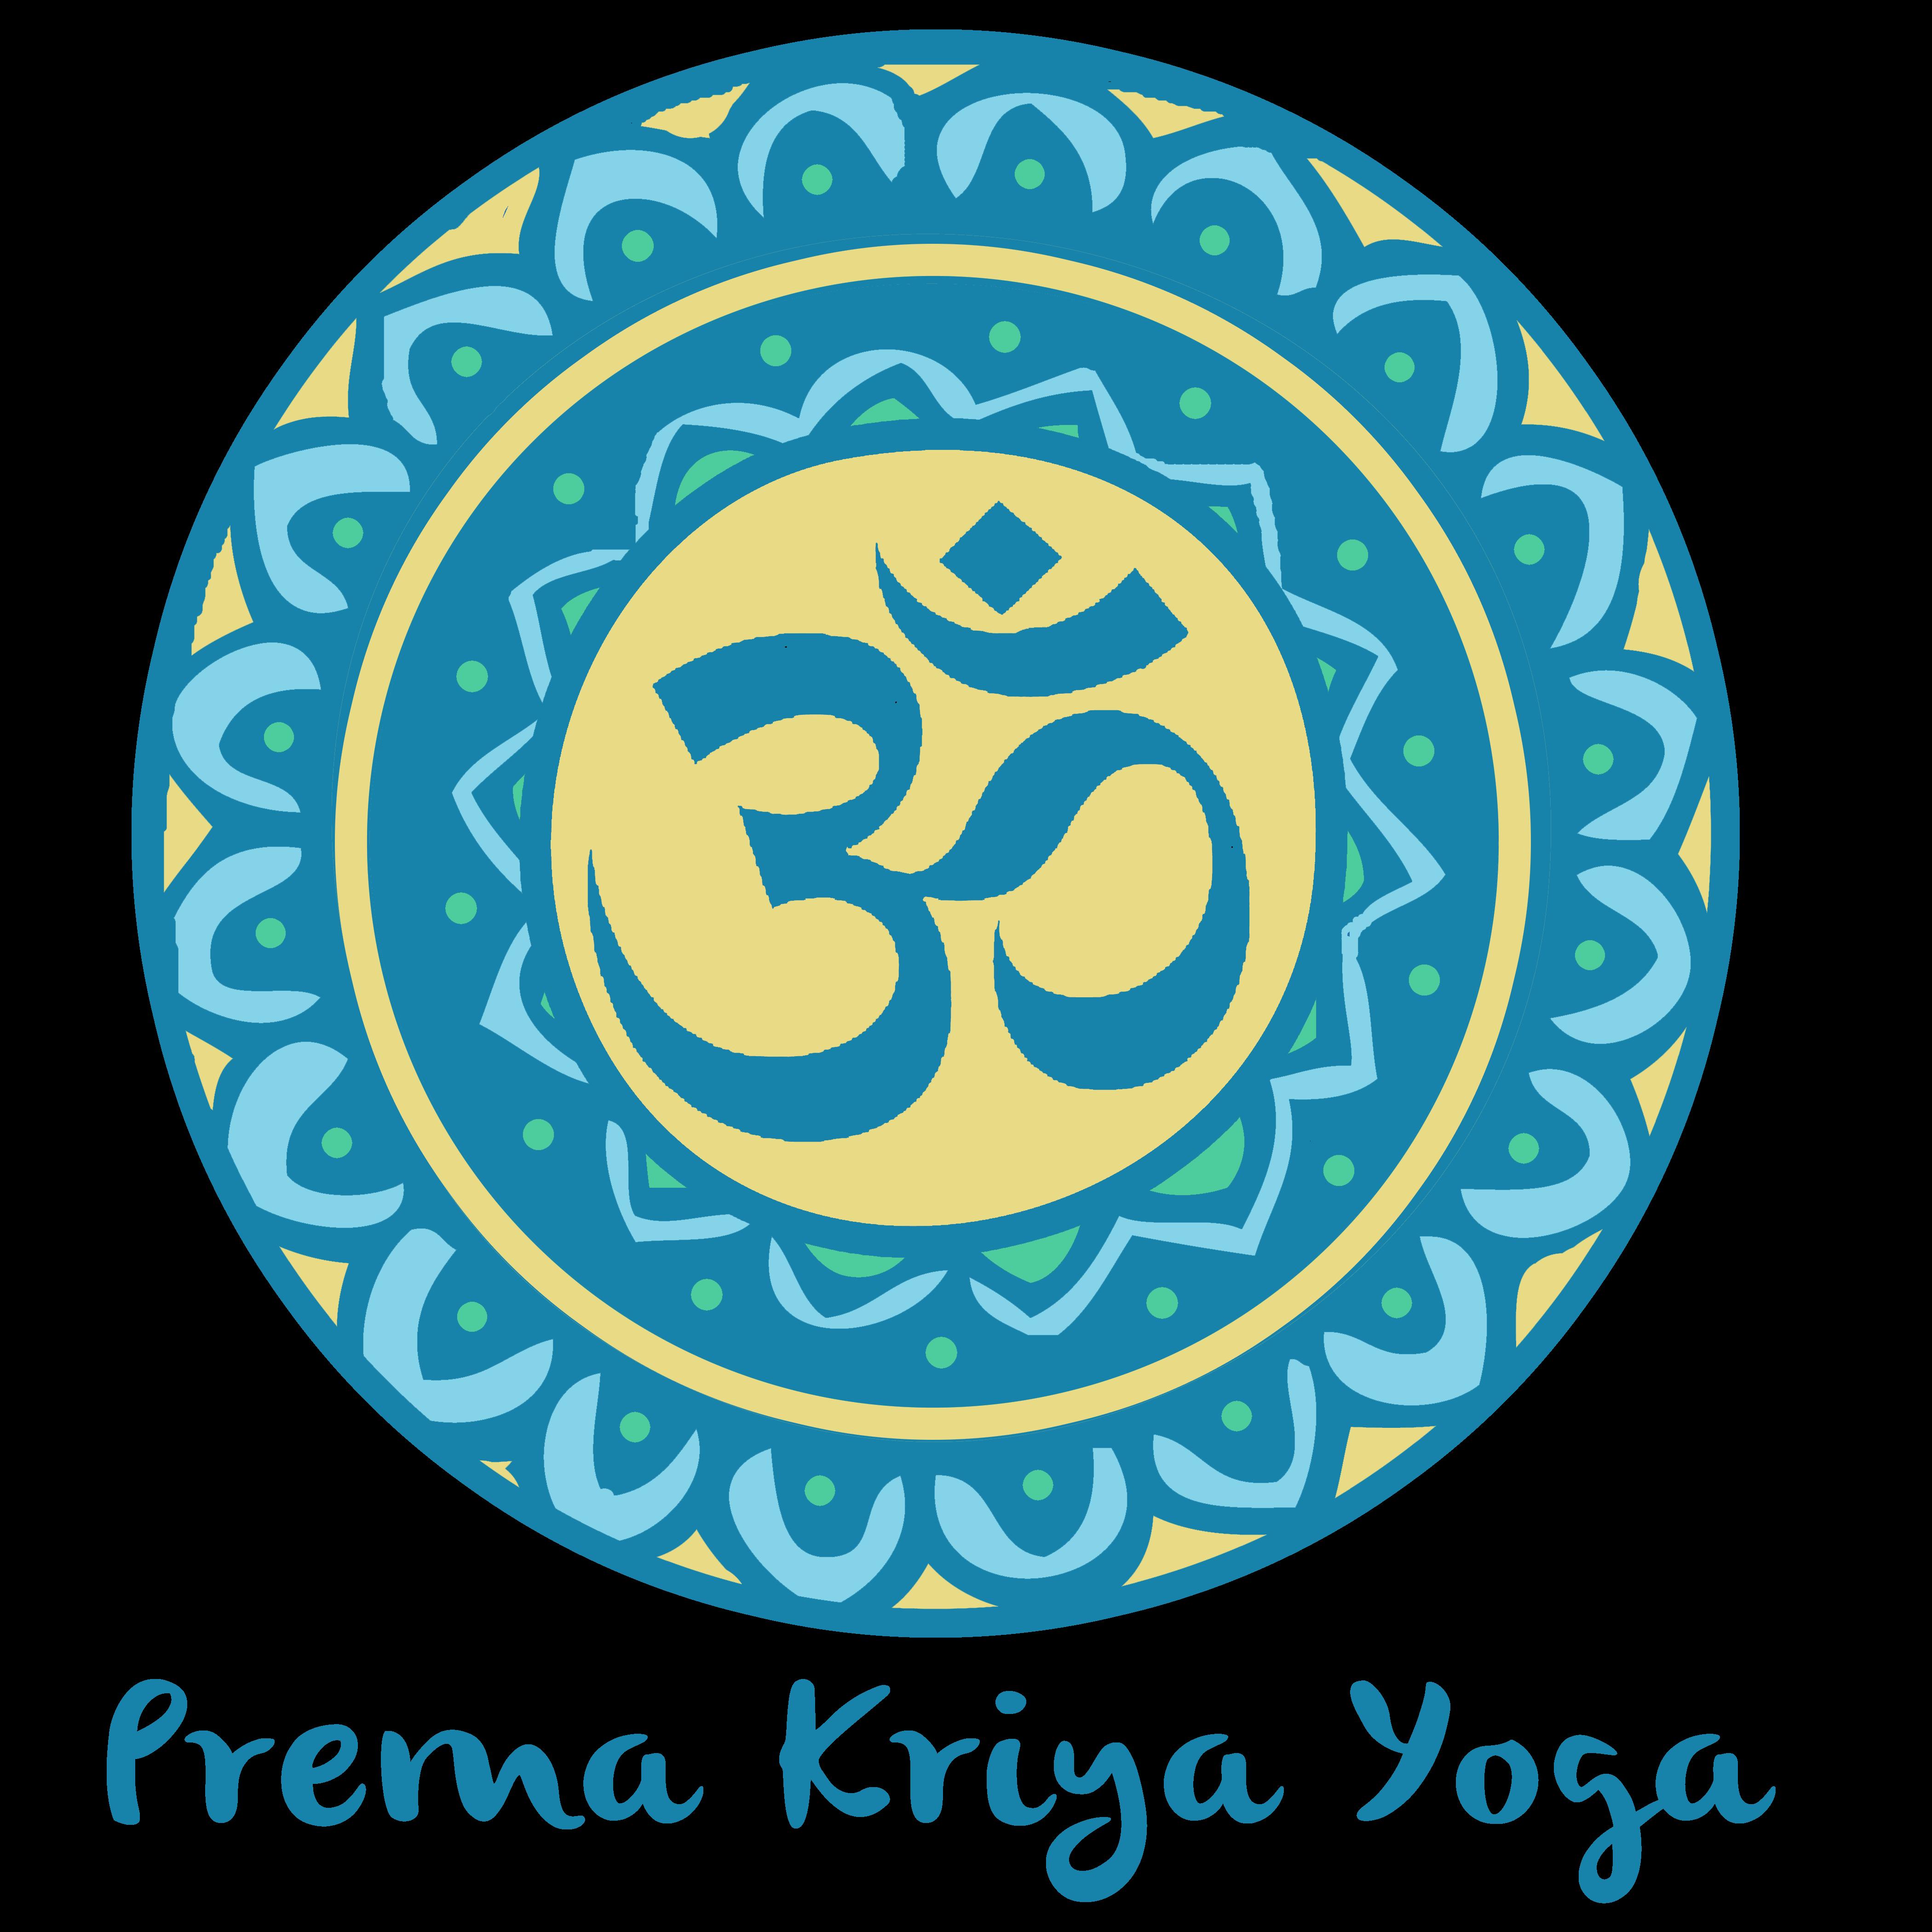 logo prema kriya yoga org